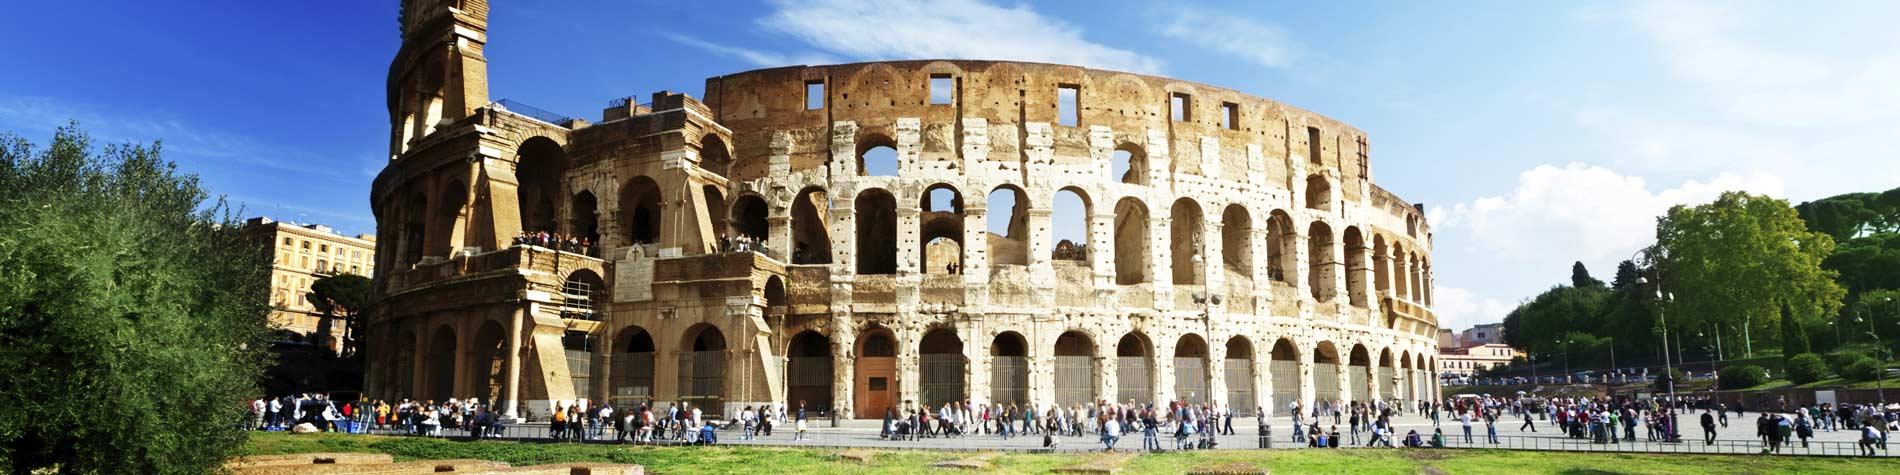 Billigflüge Nach Italien Ab 598 Ryanaircom